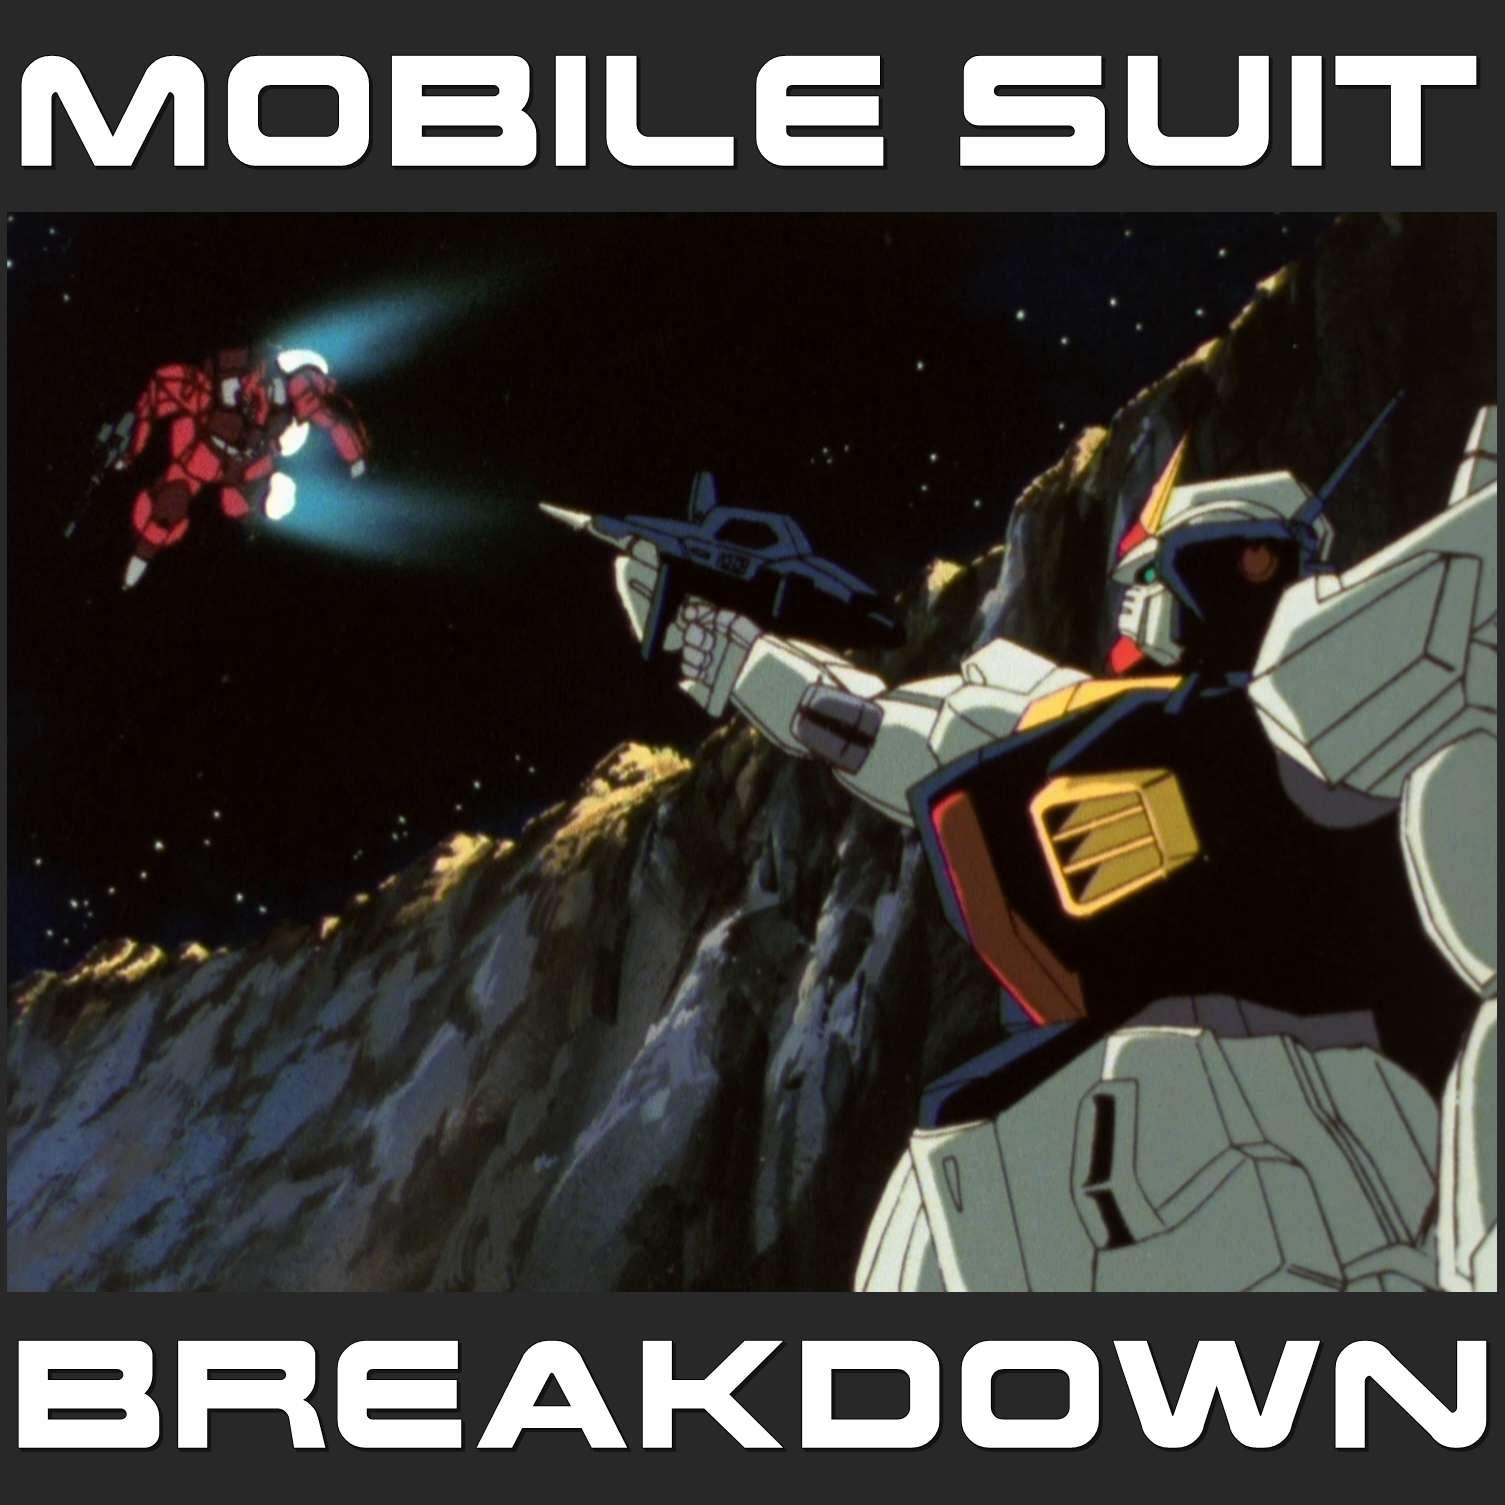 Mobile Suit Breakdown: the Gundam Anime Podcast - Podcast – Podtail